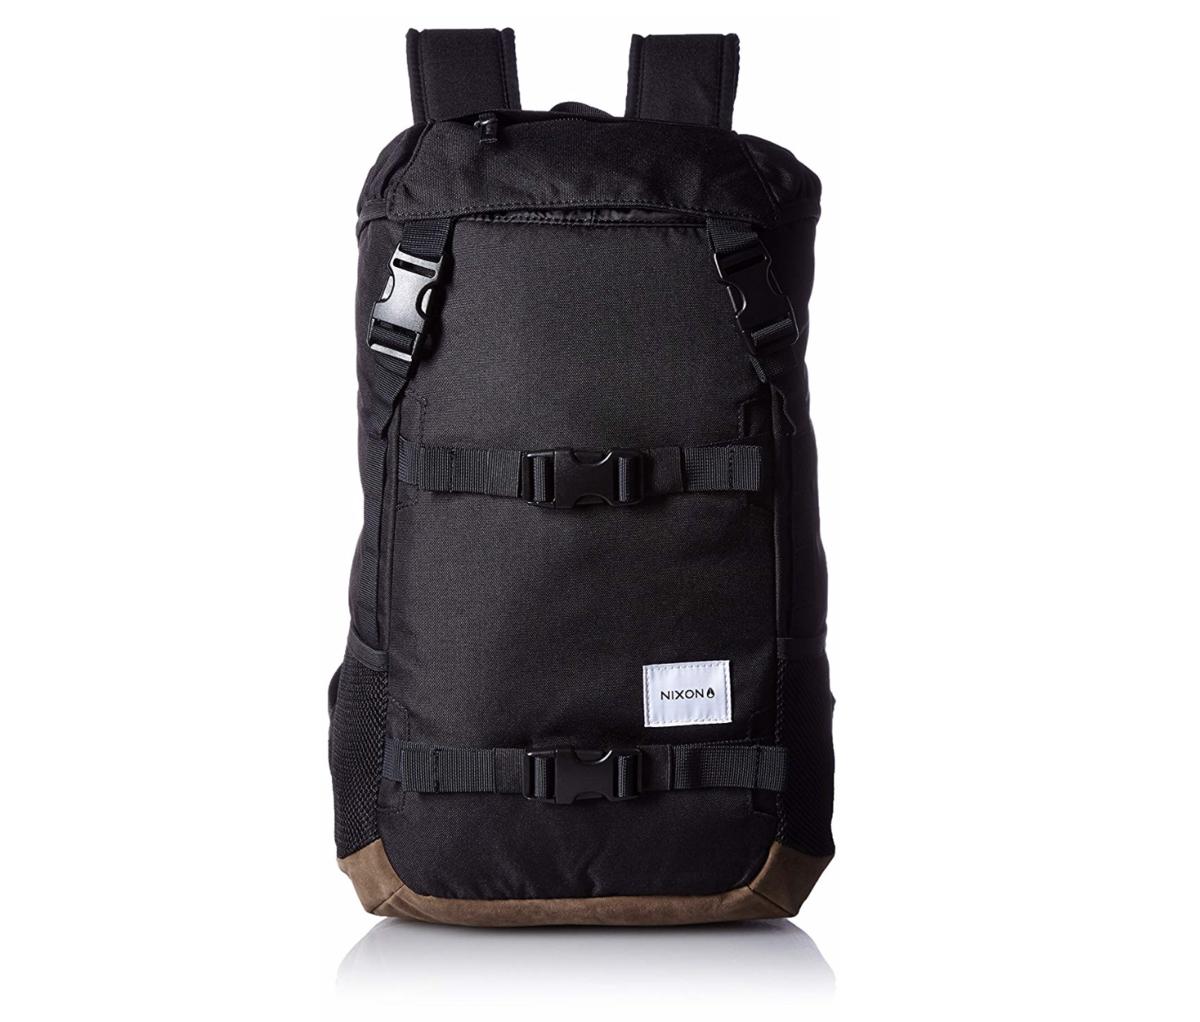 f:id:thebackpack:20190329211902p:plain